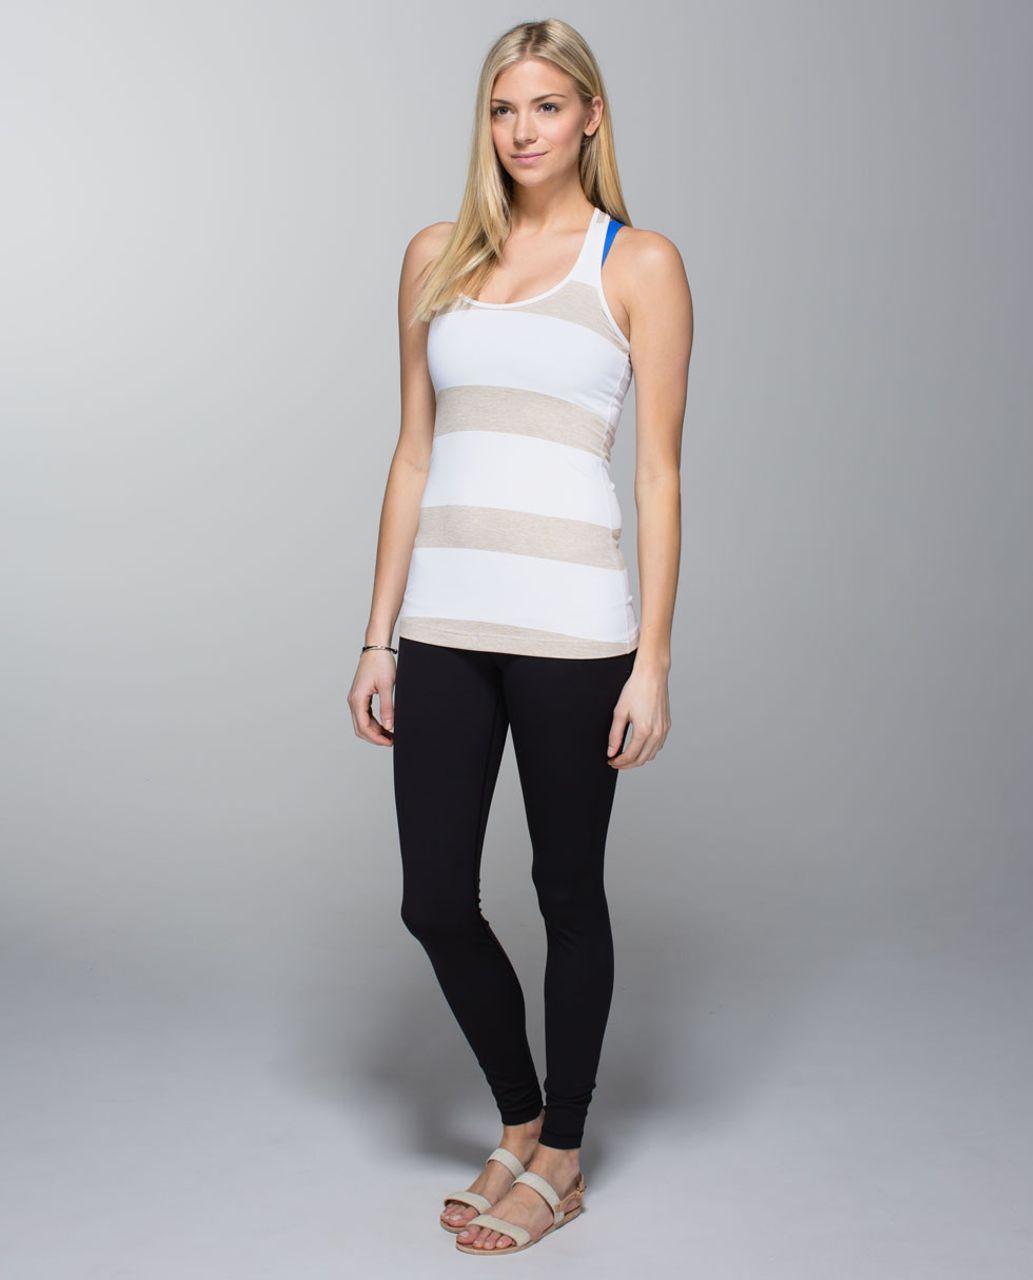 Lululemon Cool Racerback - Stroll Stripe Heathered Cashew White / White